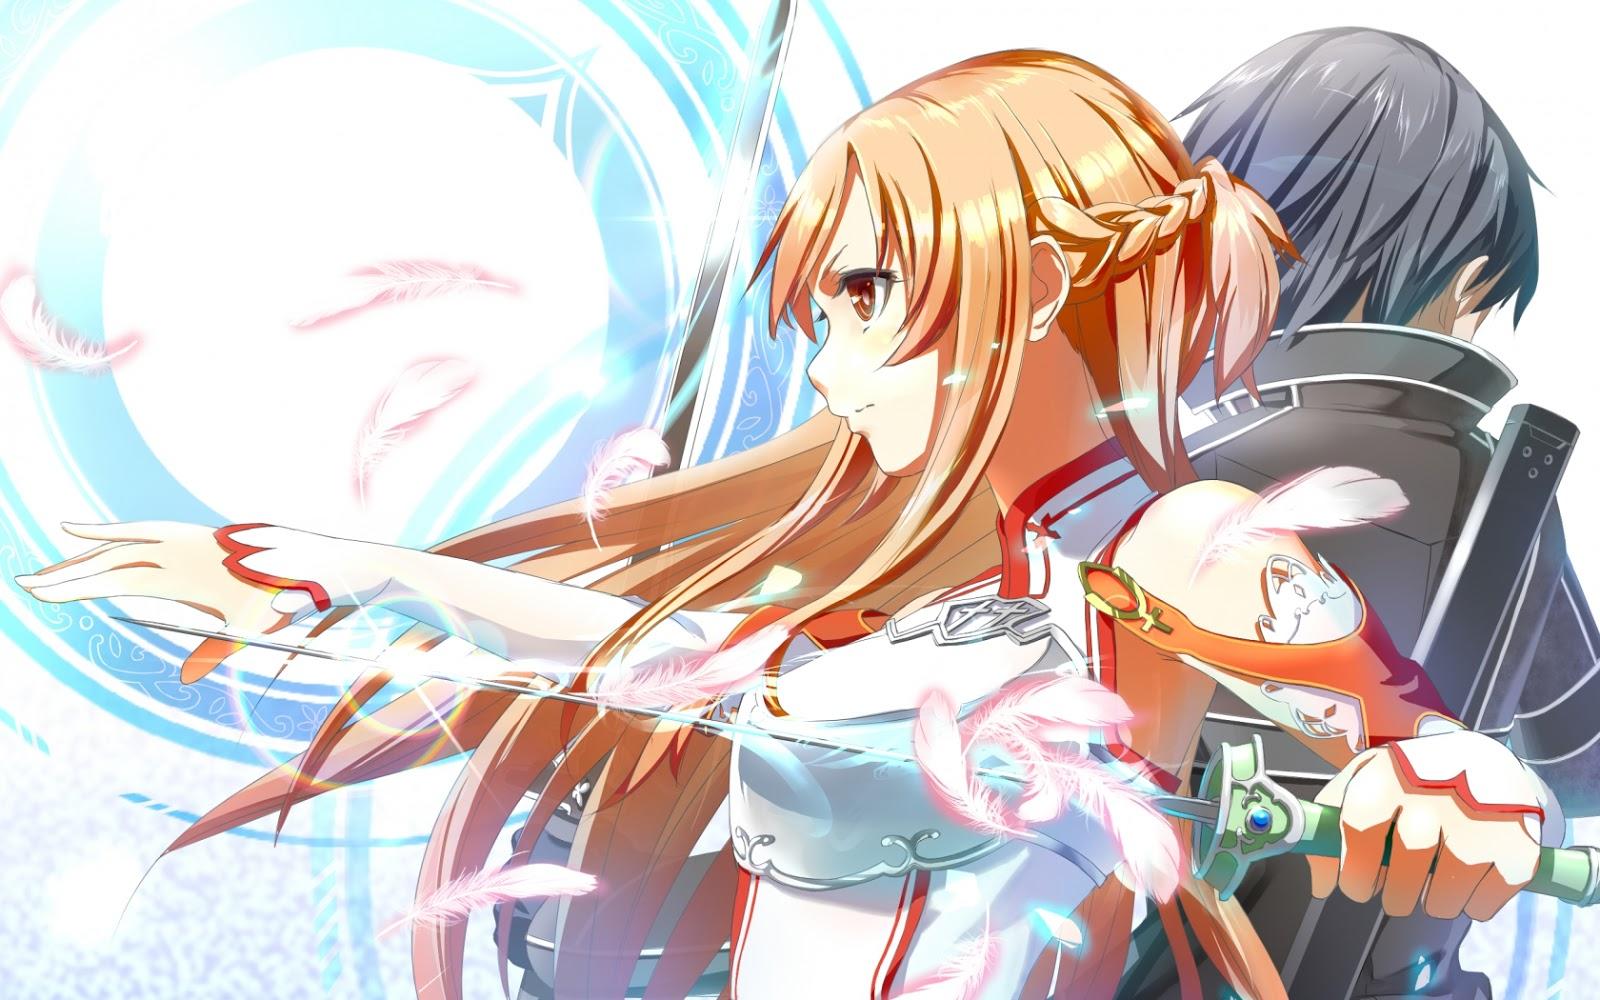 Sword art online asuna and kirito hd wallpaper 1600x1000 - Fanart anime wallpaper ...